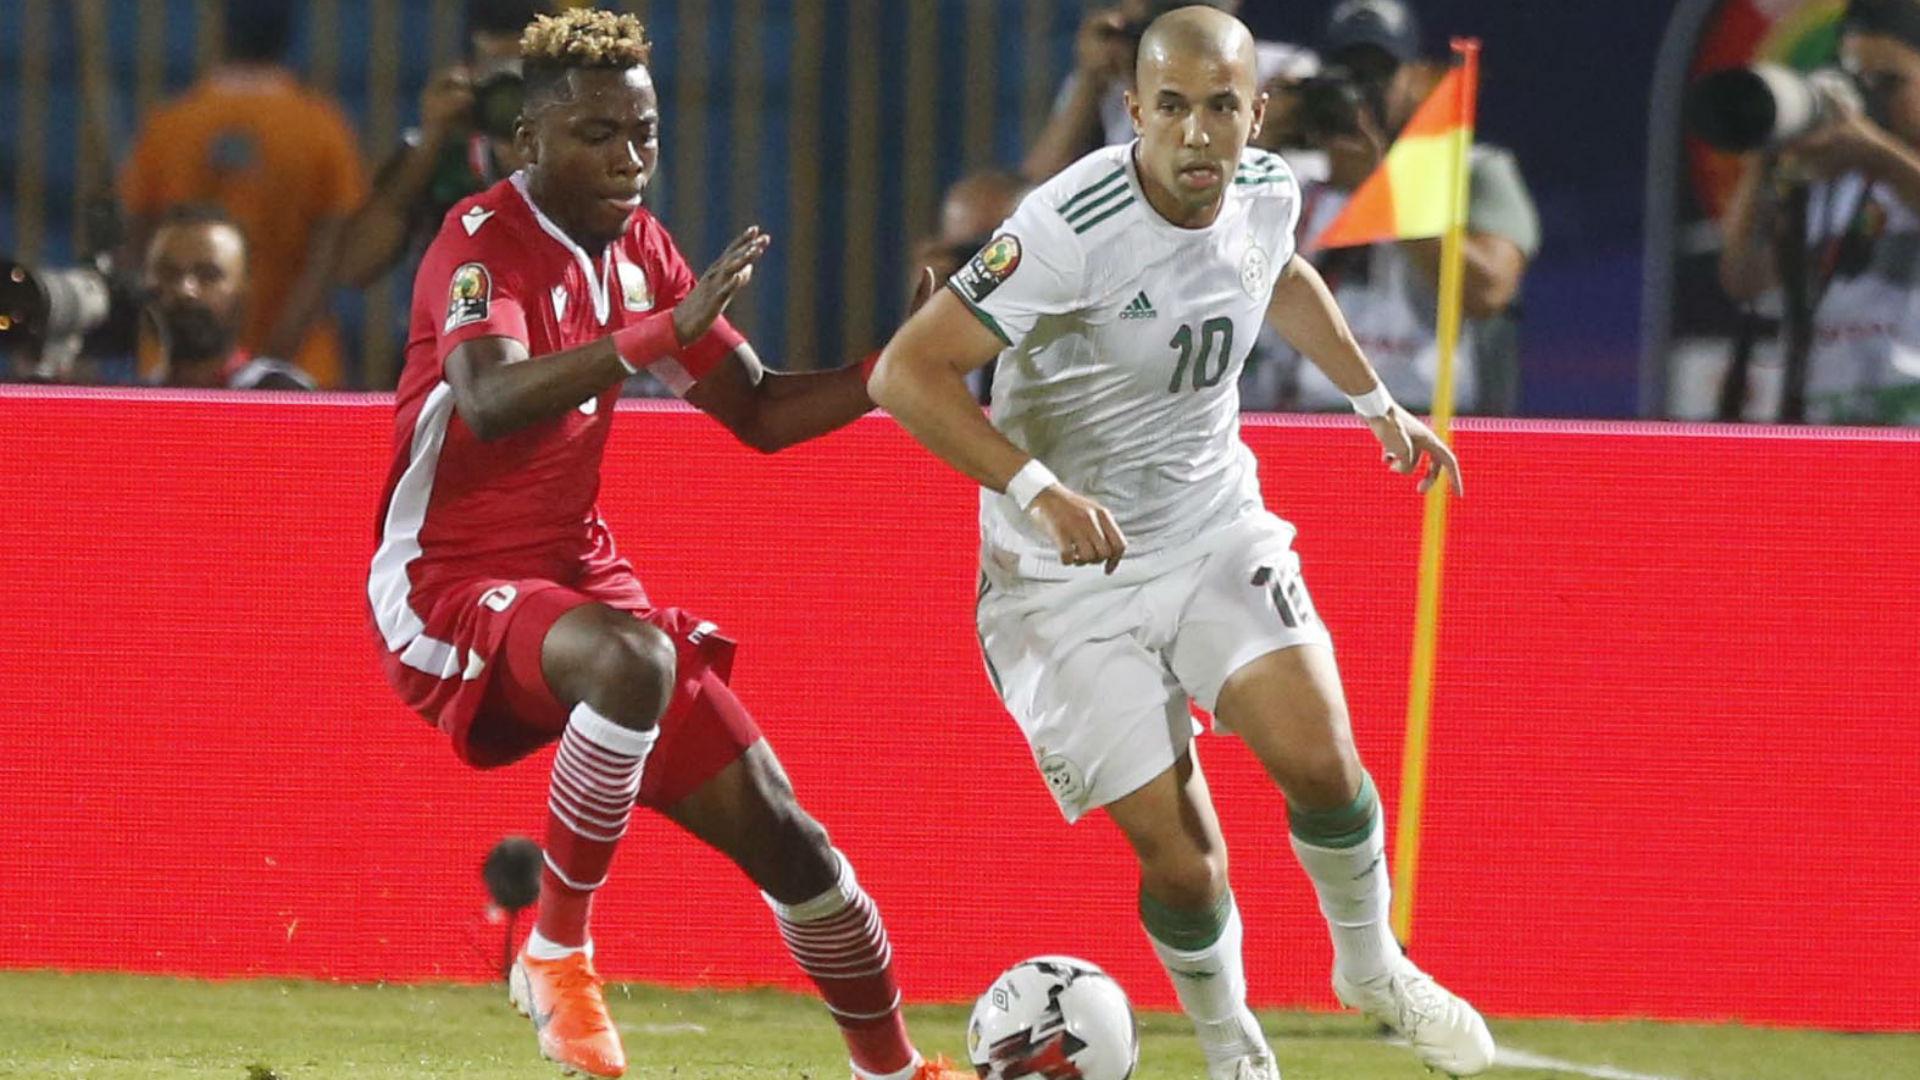 Afcon 2019: Five things Kenya learnt against Algeria